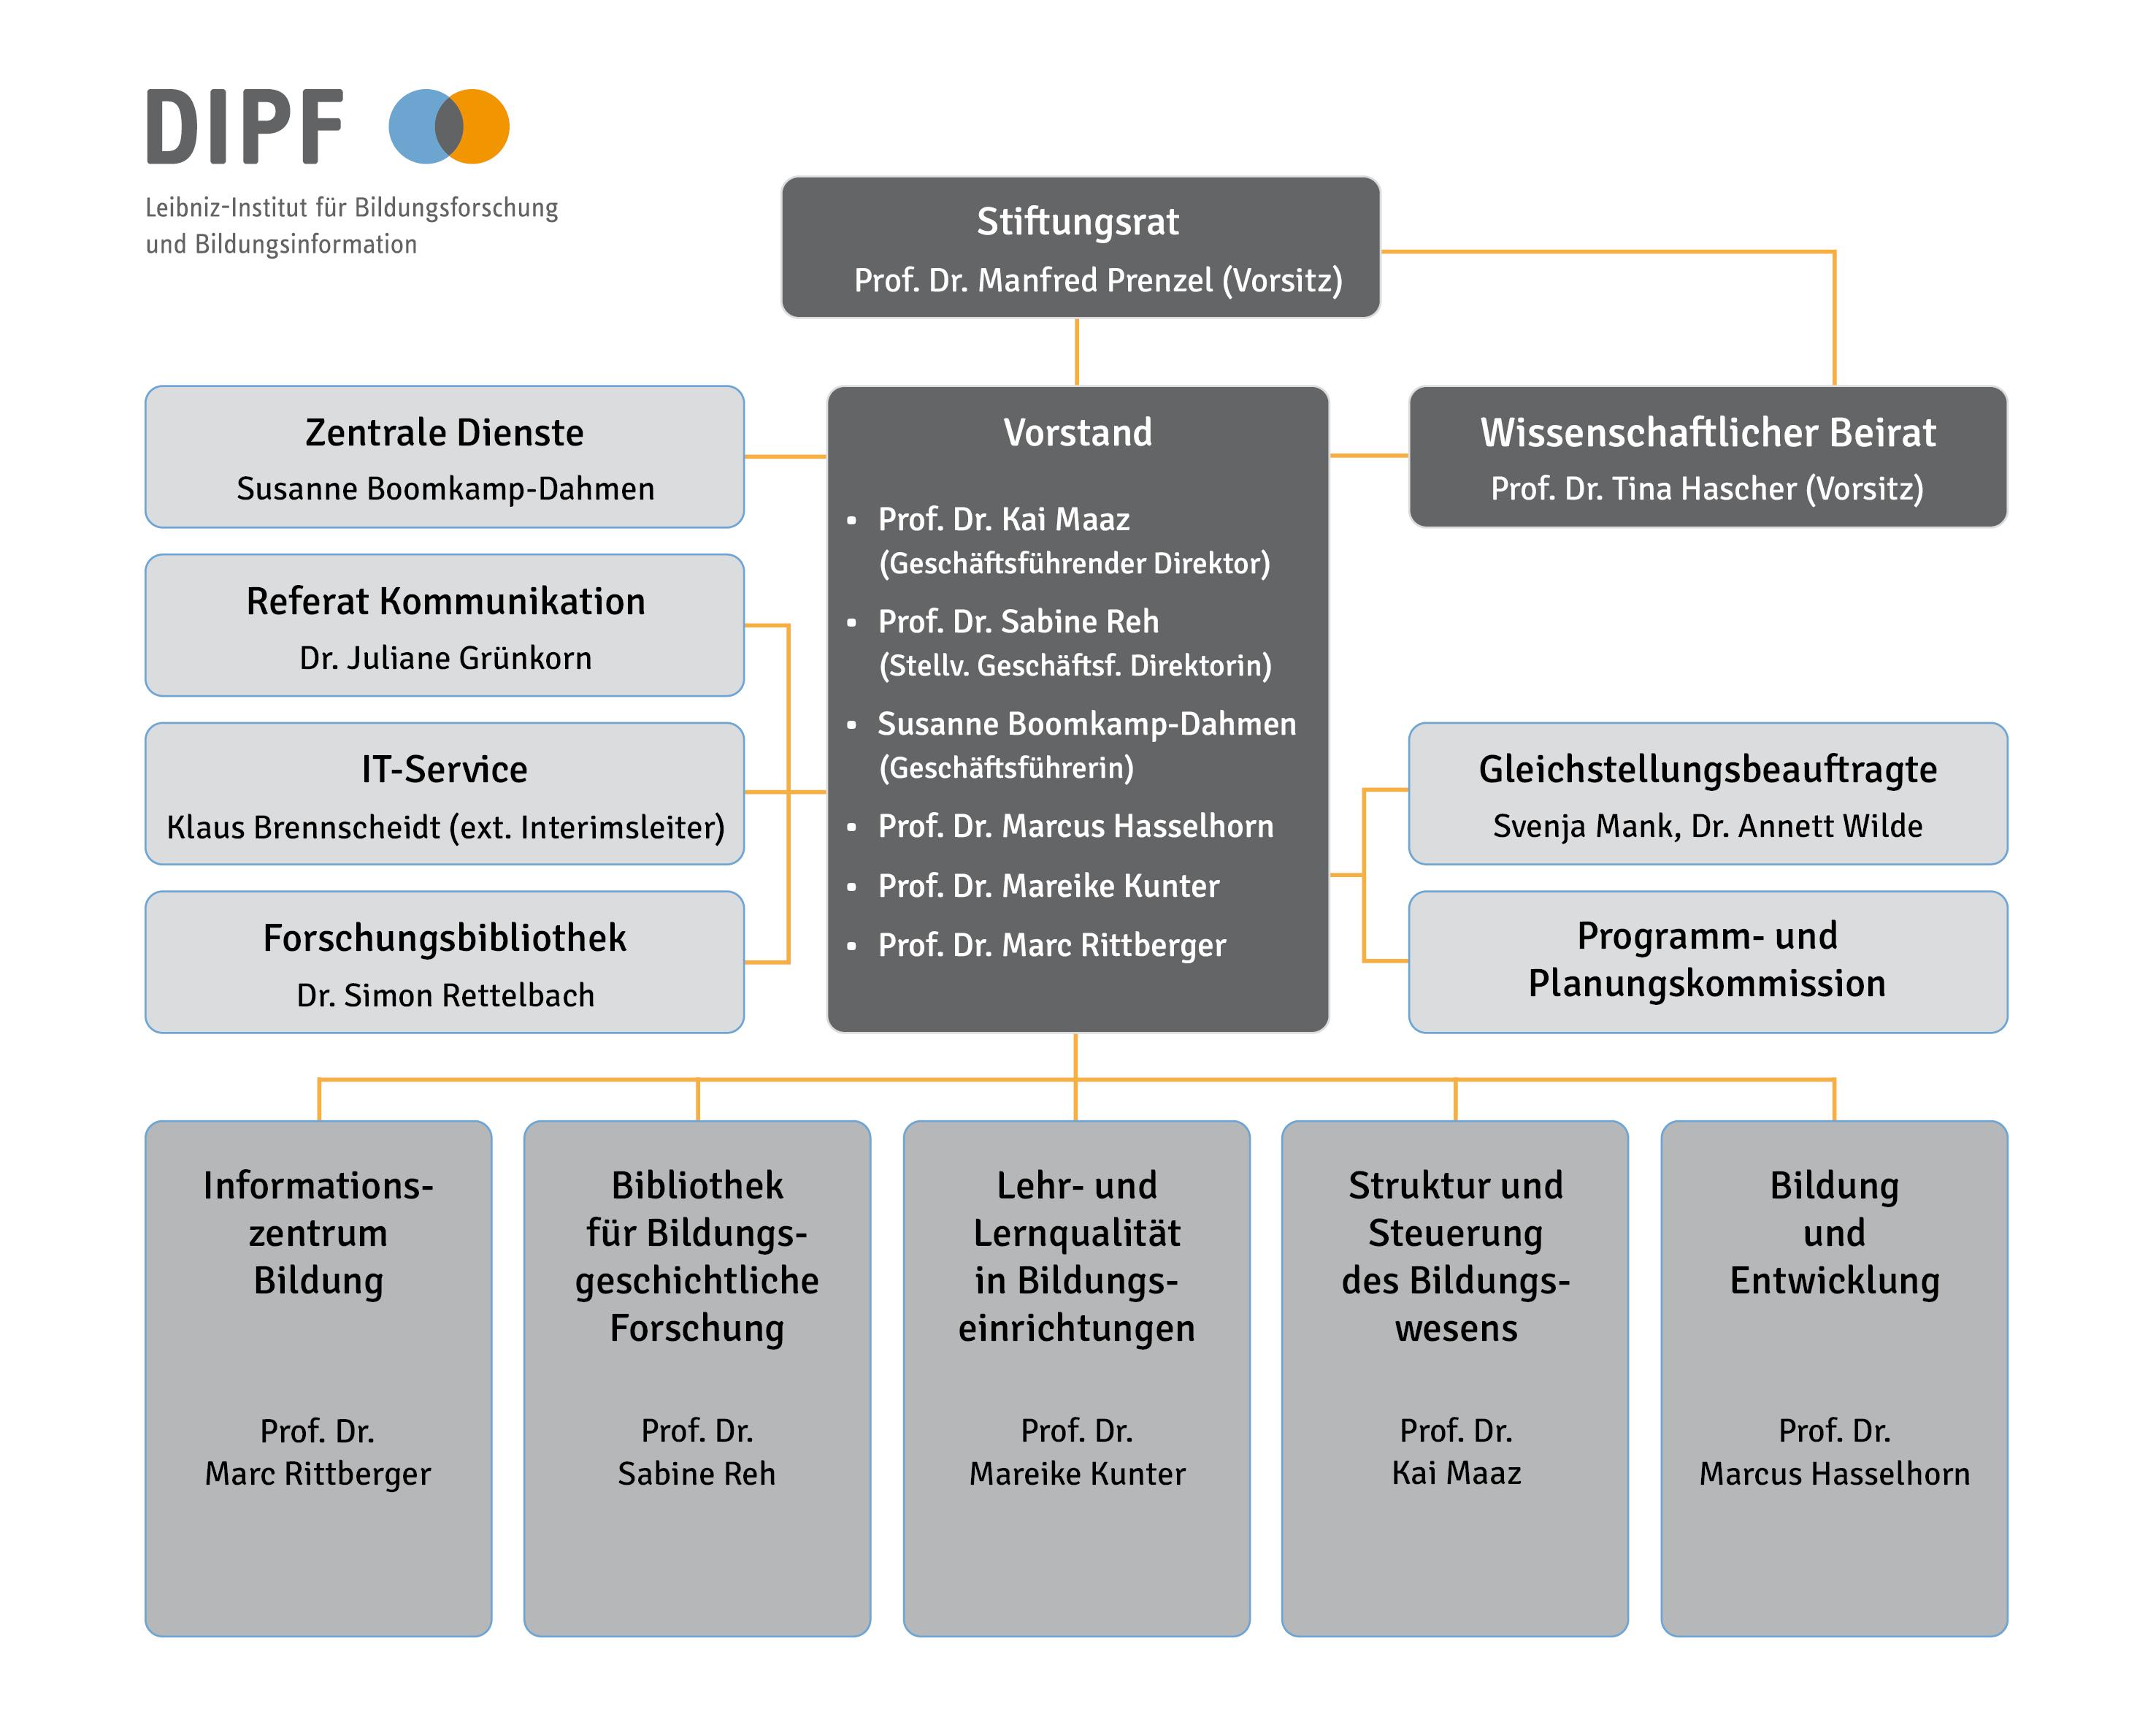 DIPF-Organigramm 2020-05-01